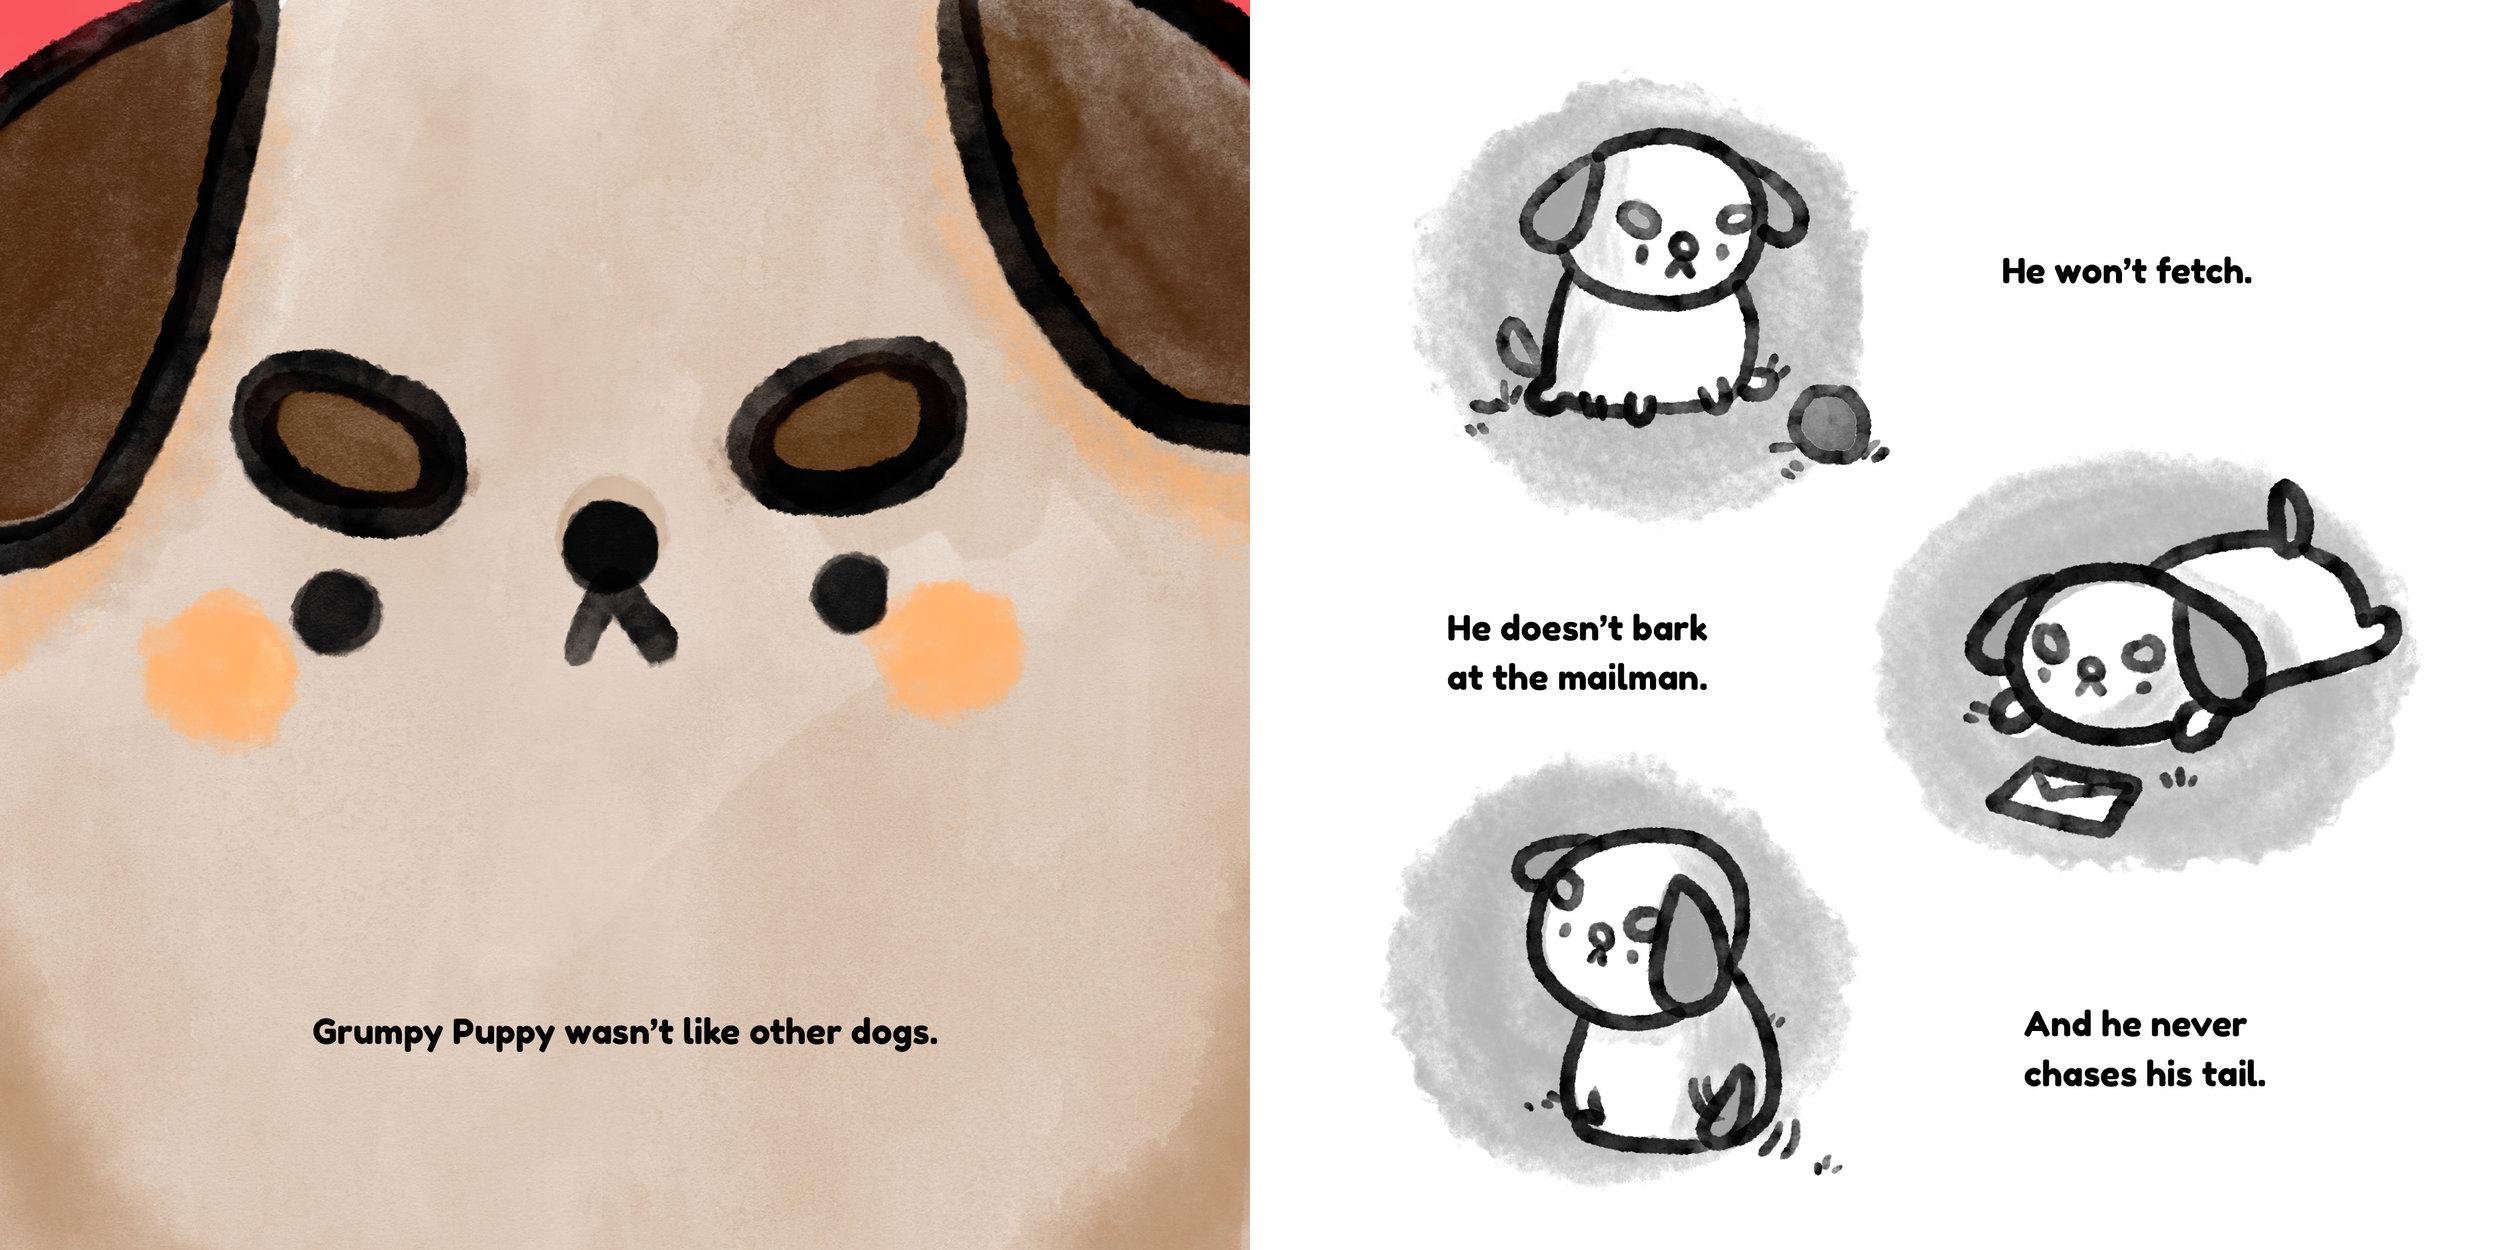 GrumpyPuppy3.jpg